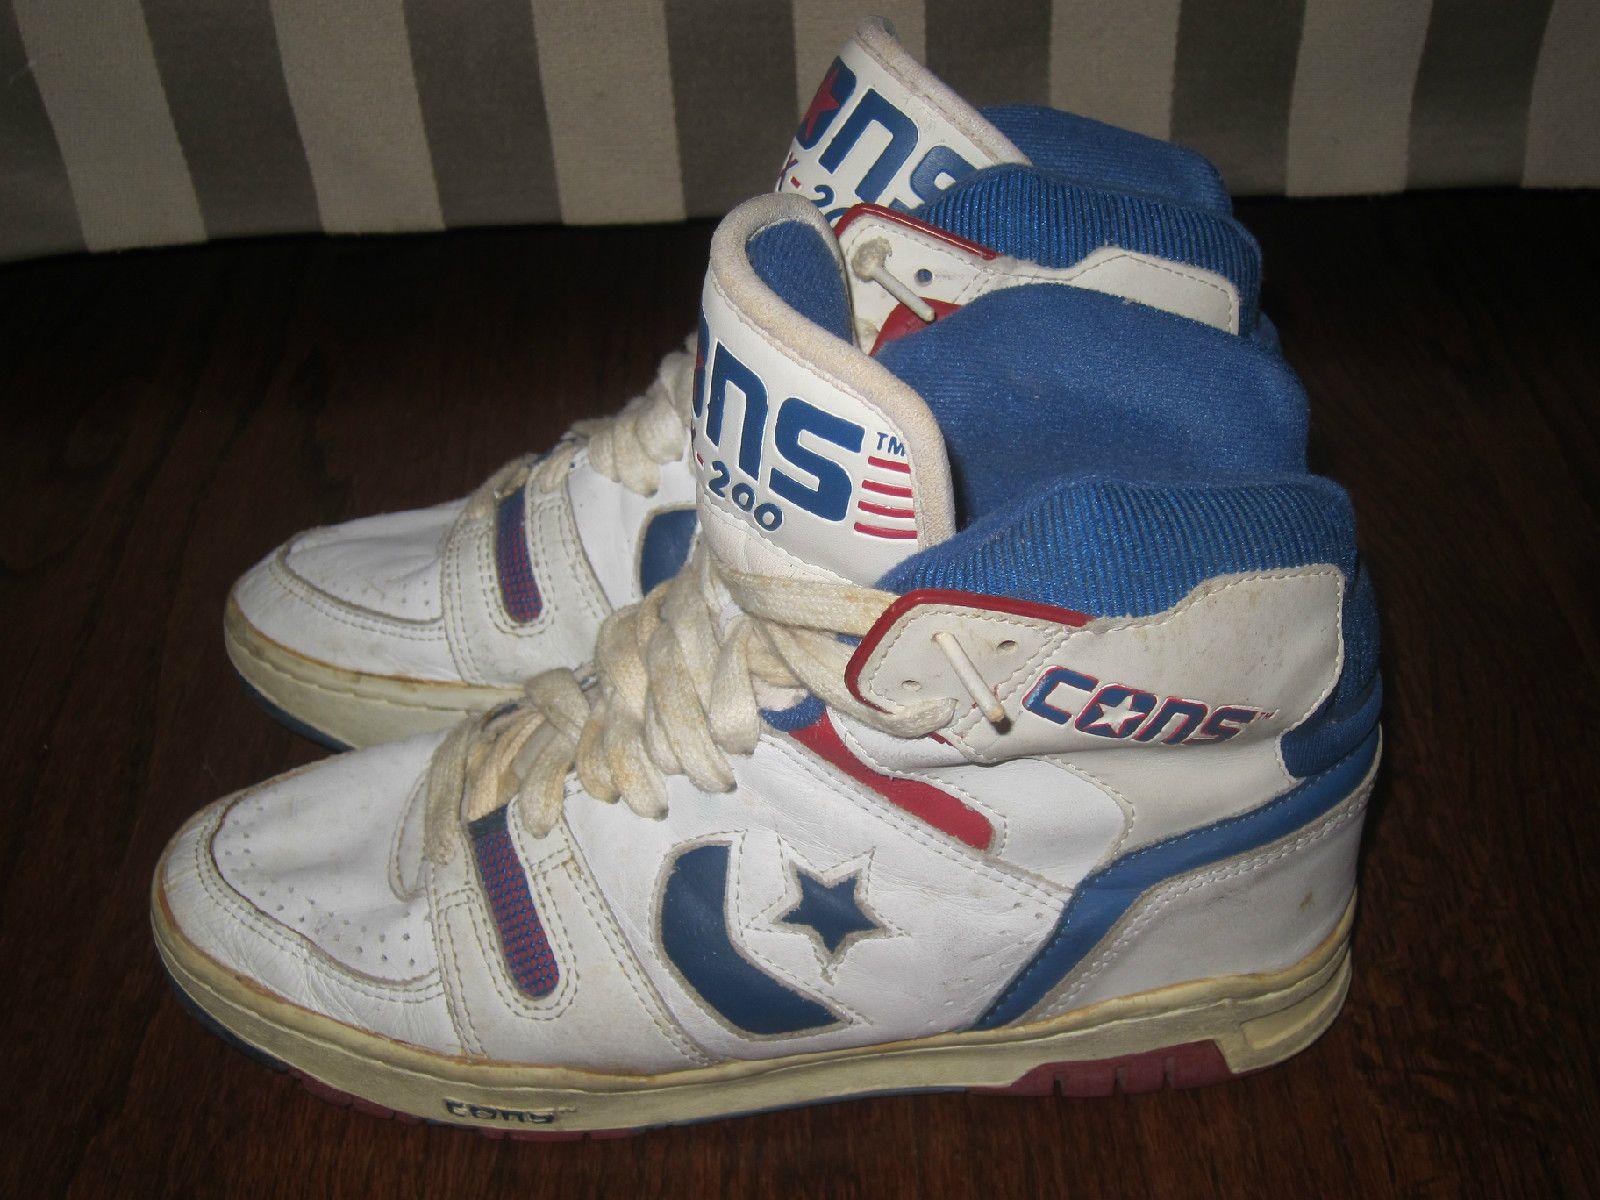 80s converse high tops